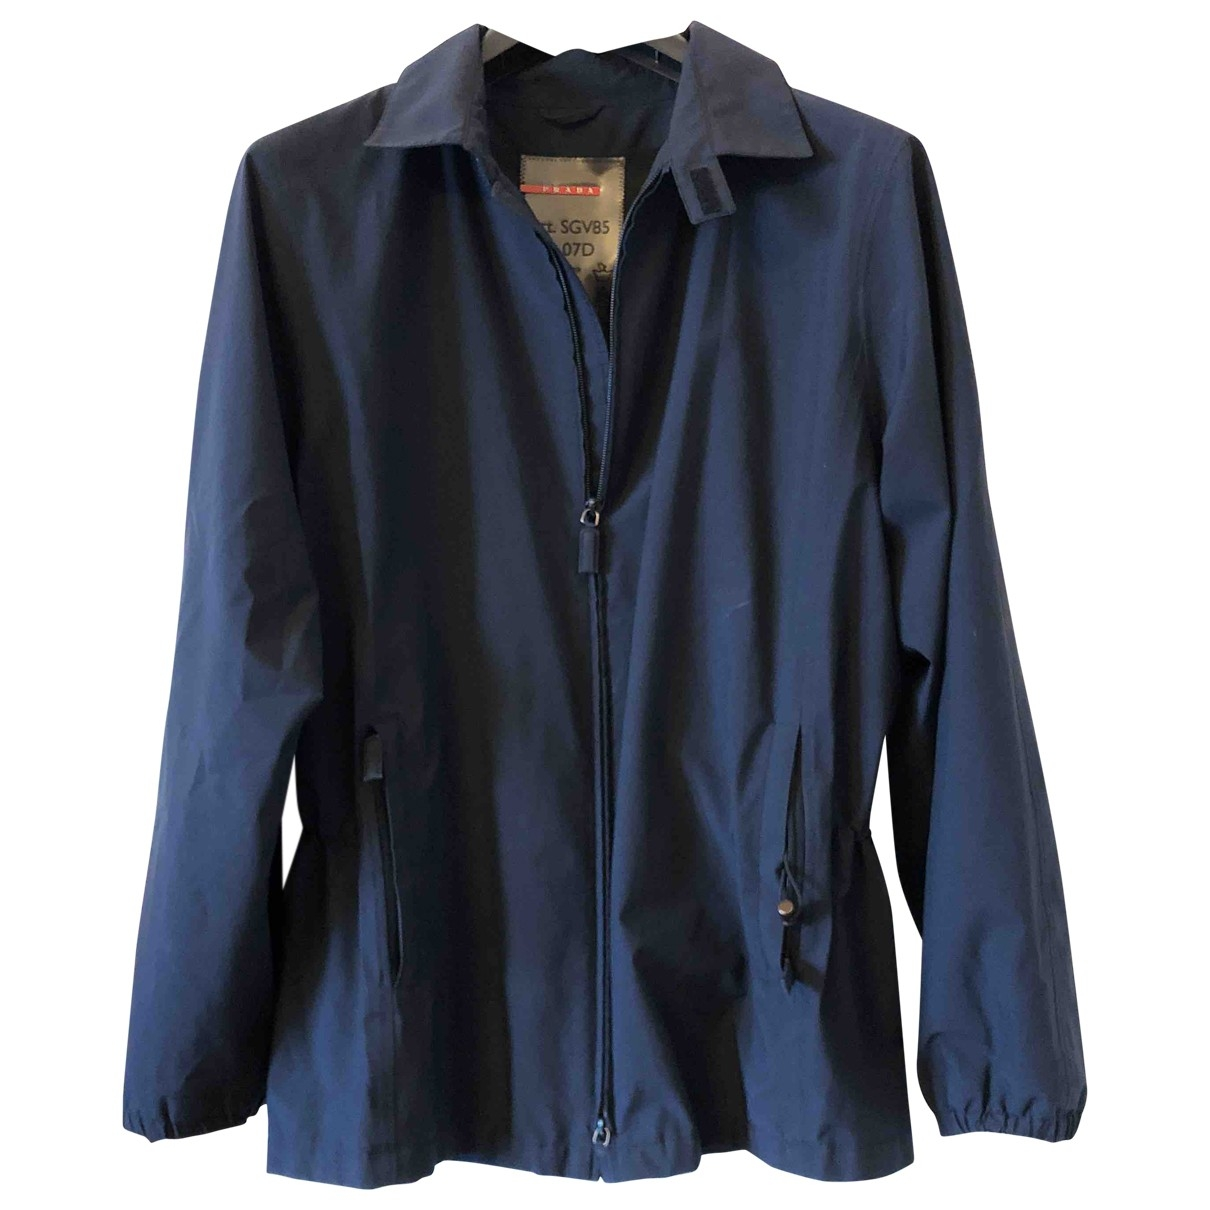 Prada \N Navy jacket  for Men 40 UK - US